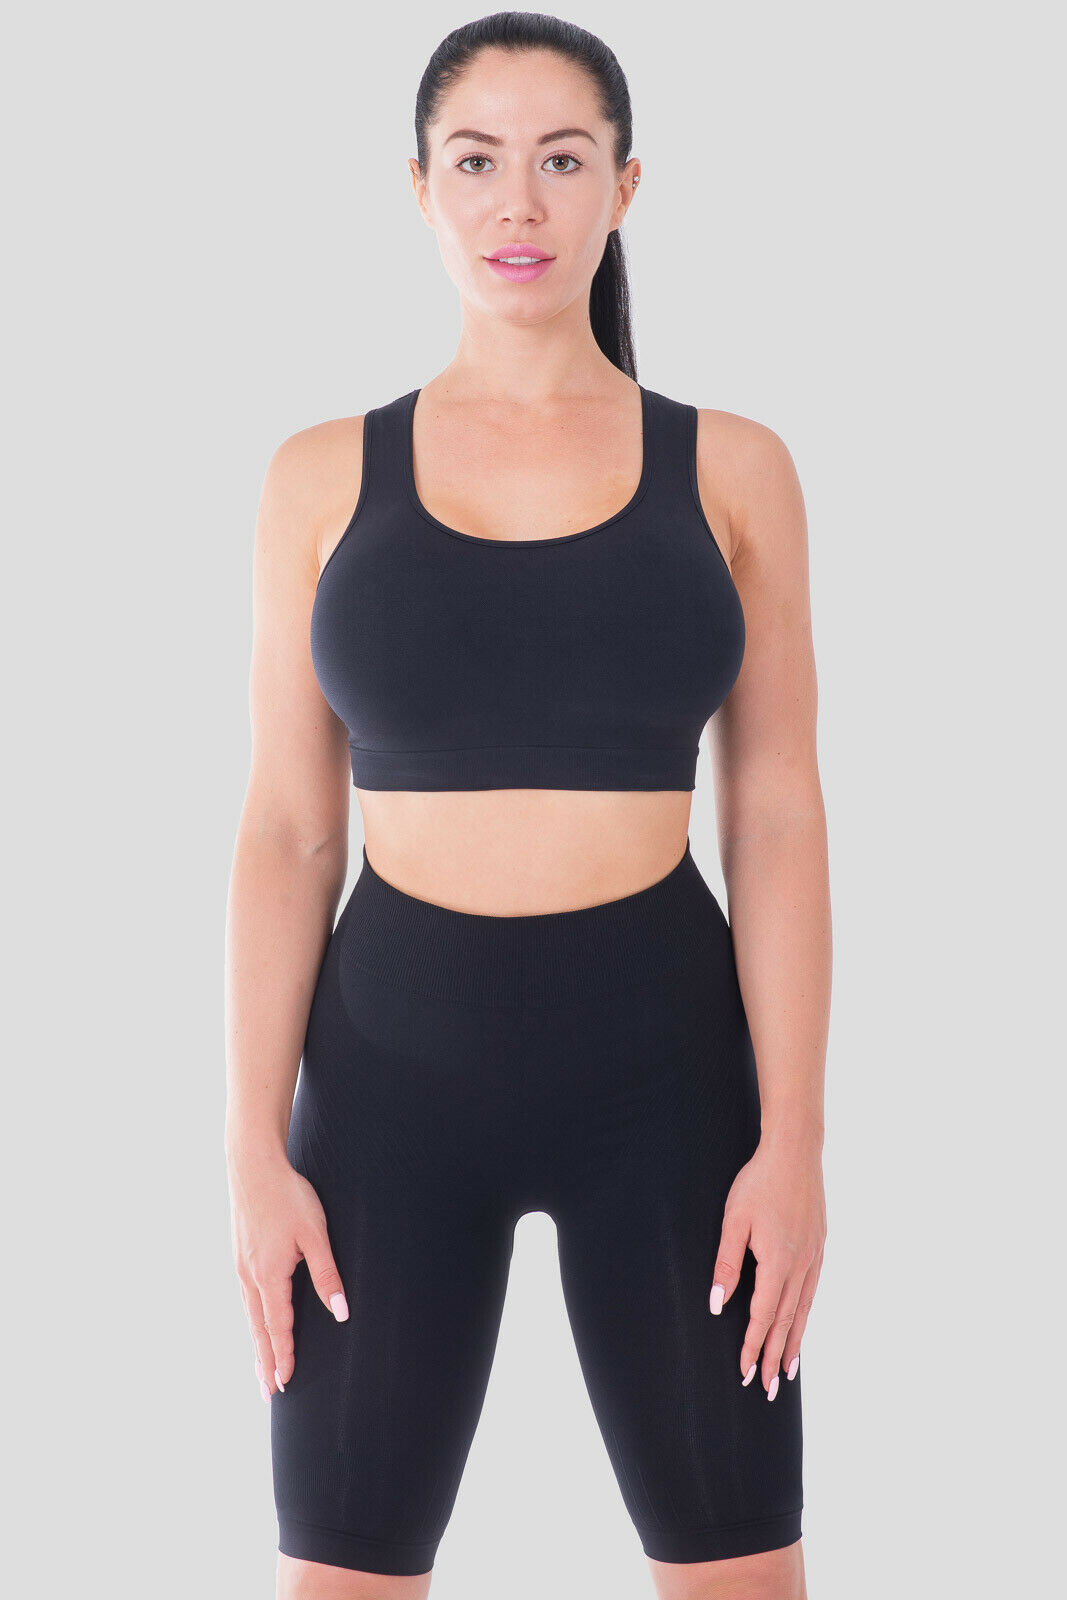 Bellissima-Women-039-s-Sport-Bra-Running-Yoga-Workout-Fitness-Racerback-Seamless thumbnail 15